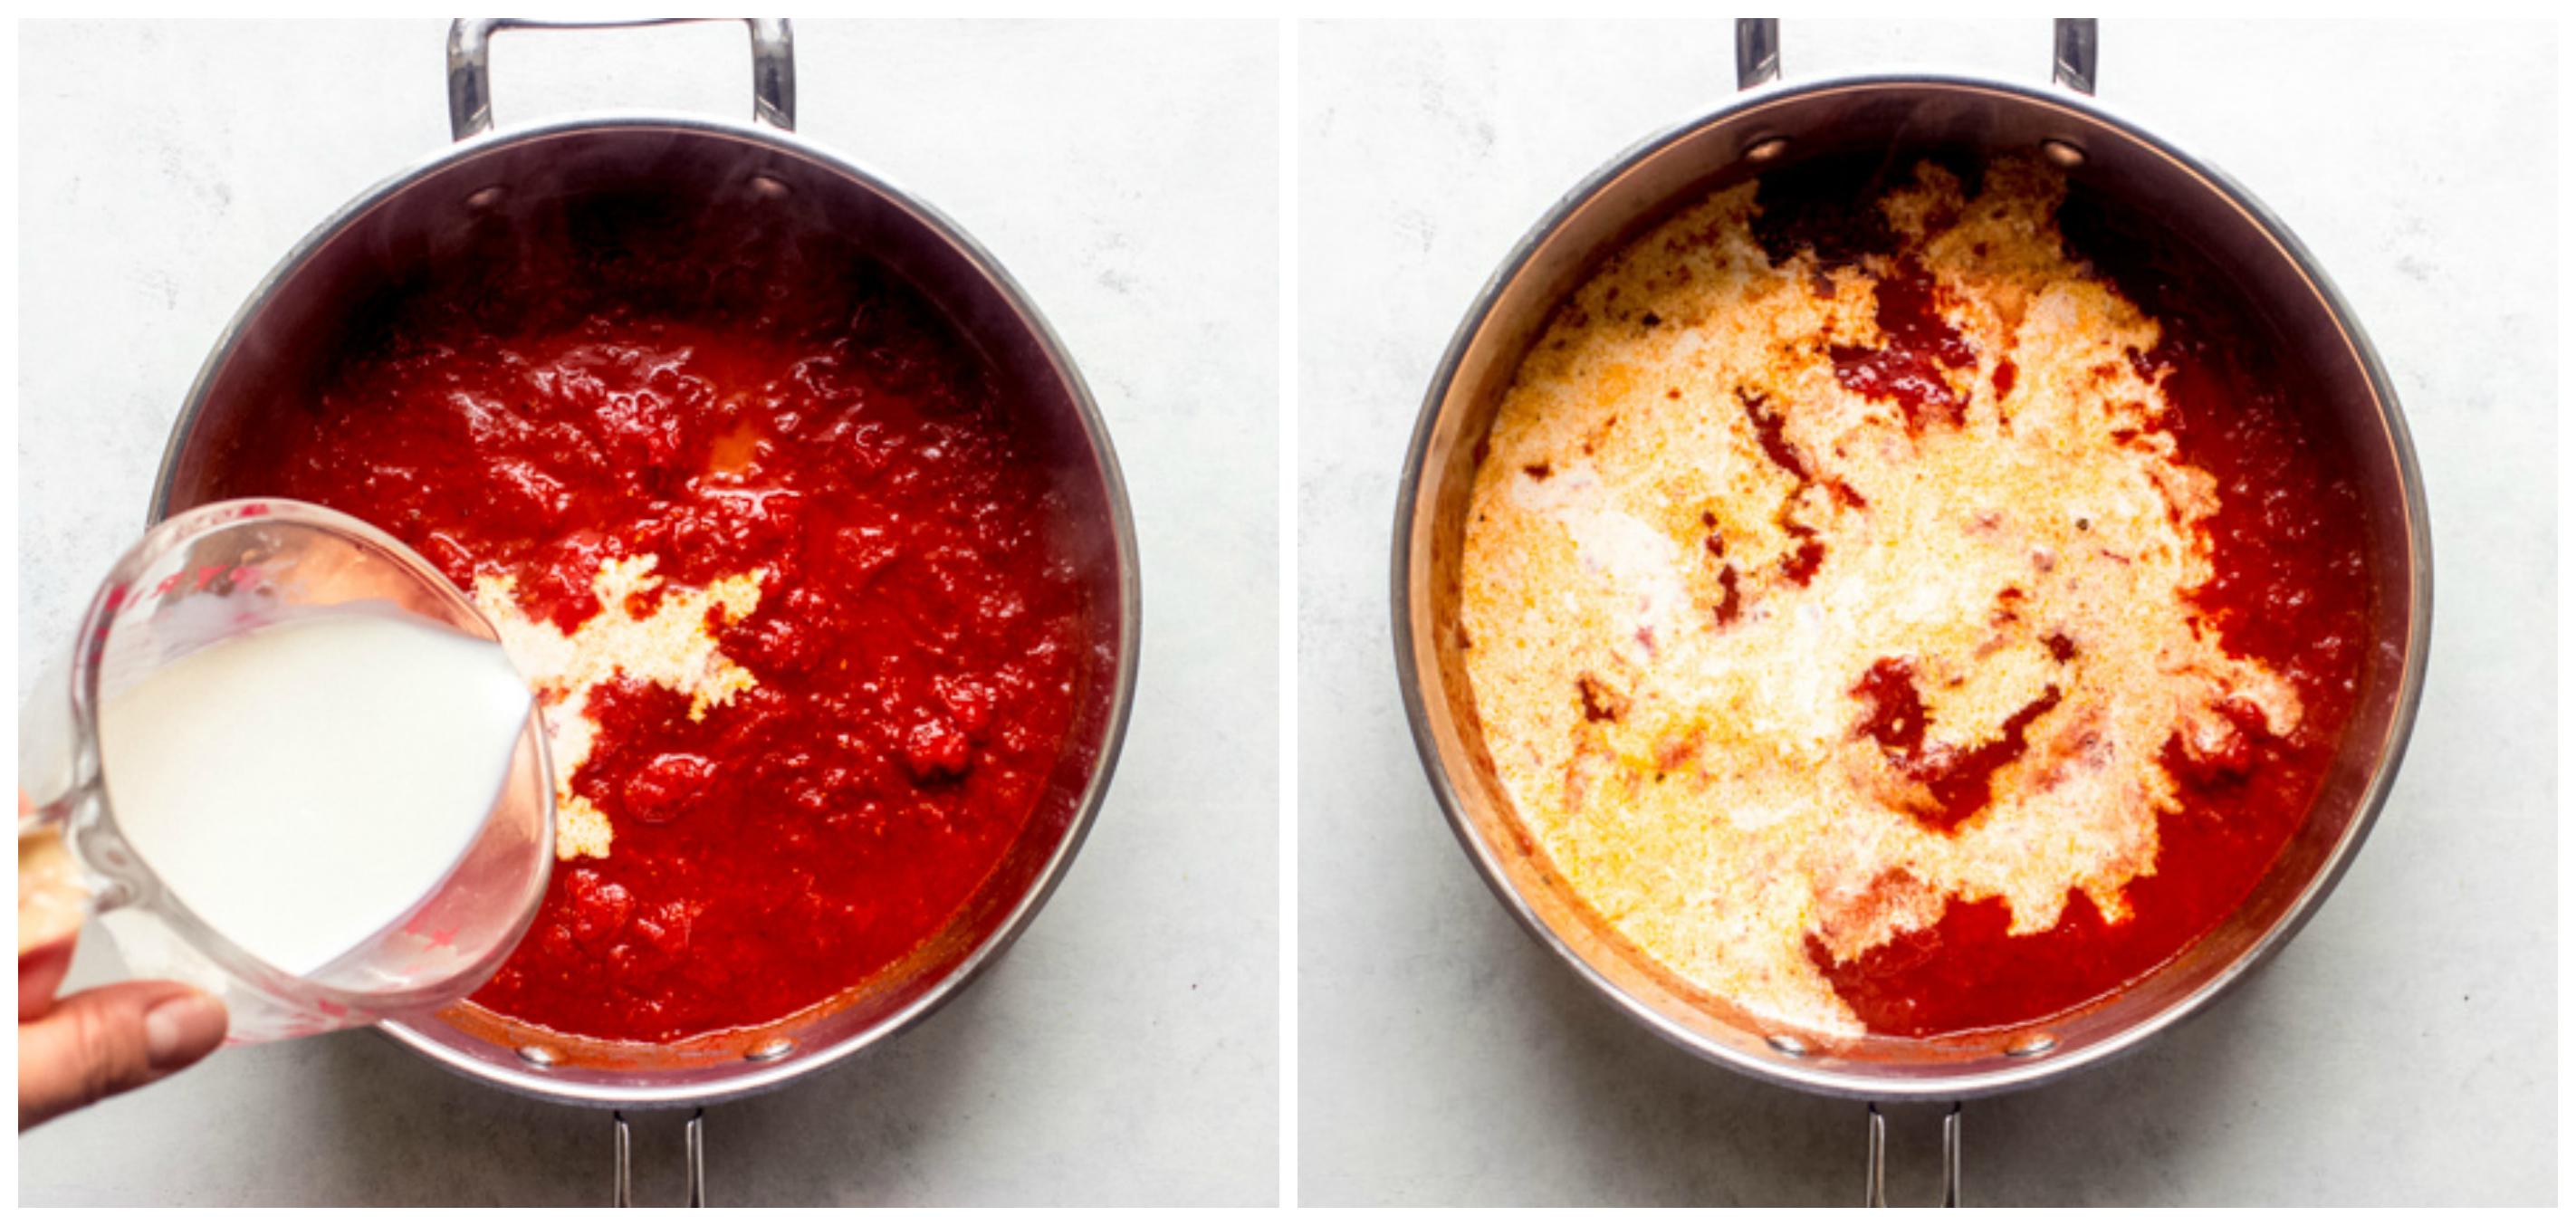 tomato cream sauce in skillet